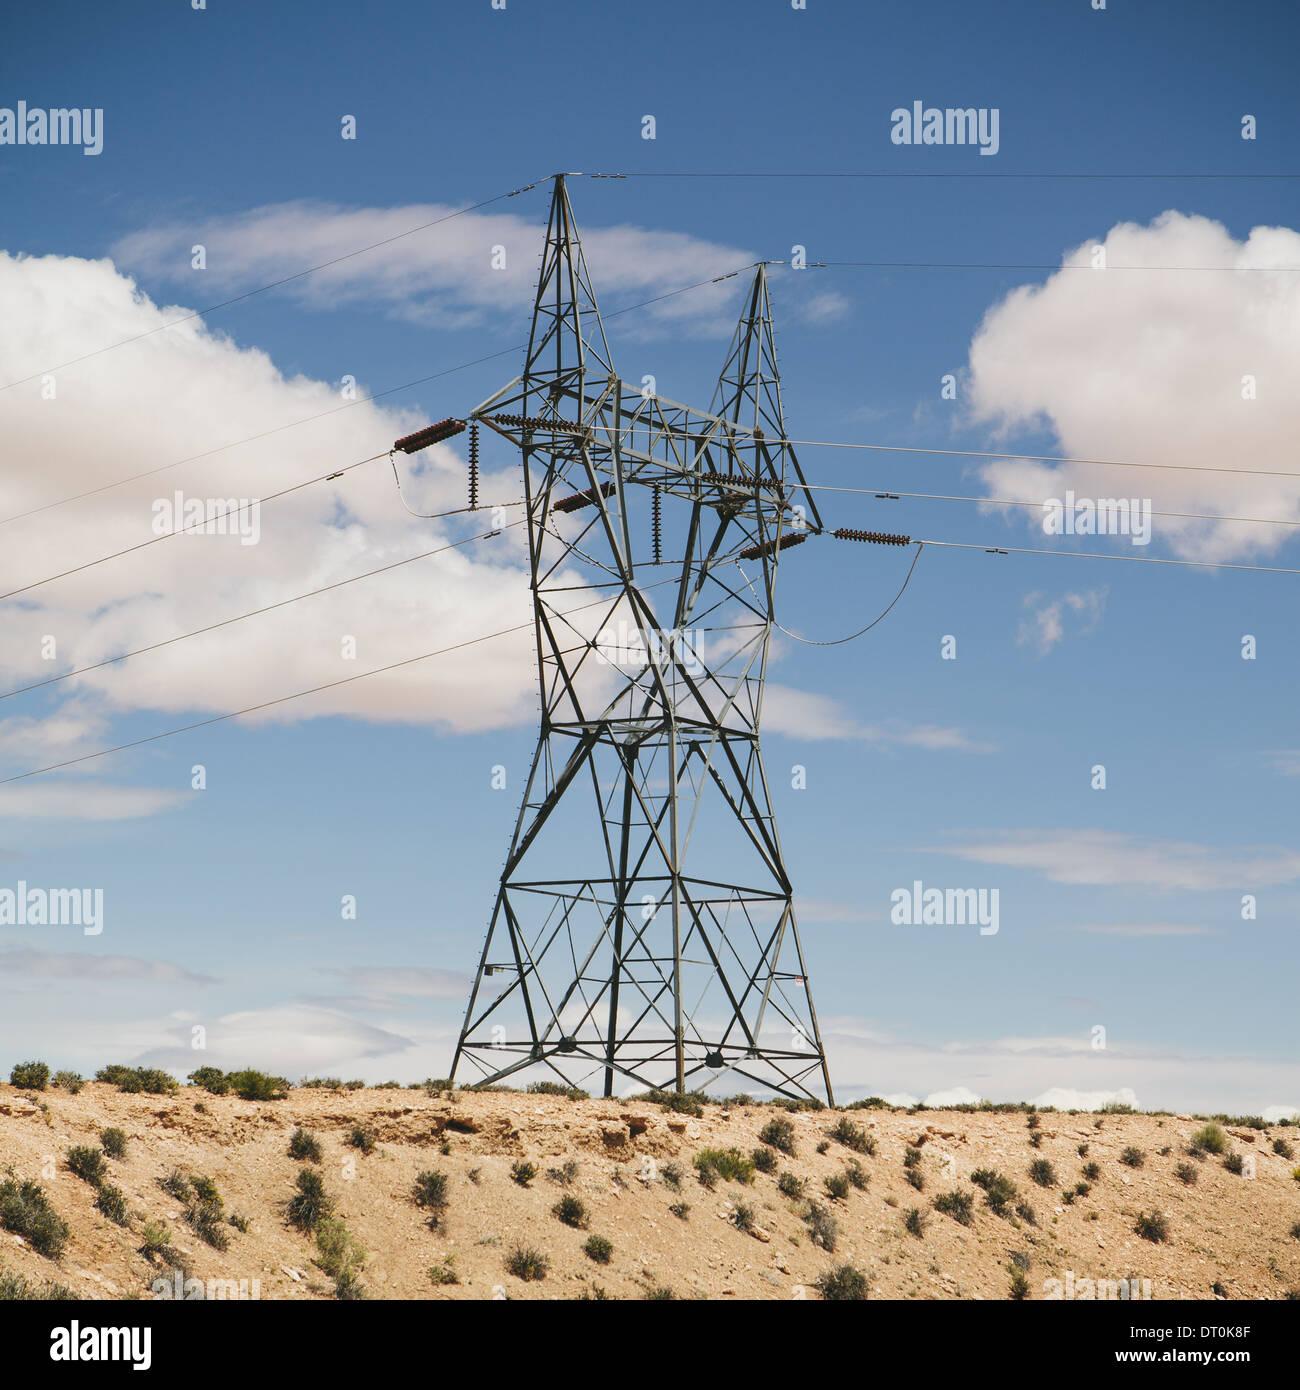 Tucson Arizona USA tall pylon carrying power lines in the desert - Stock Image